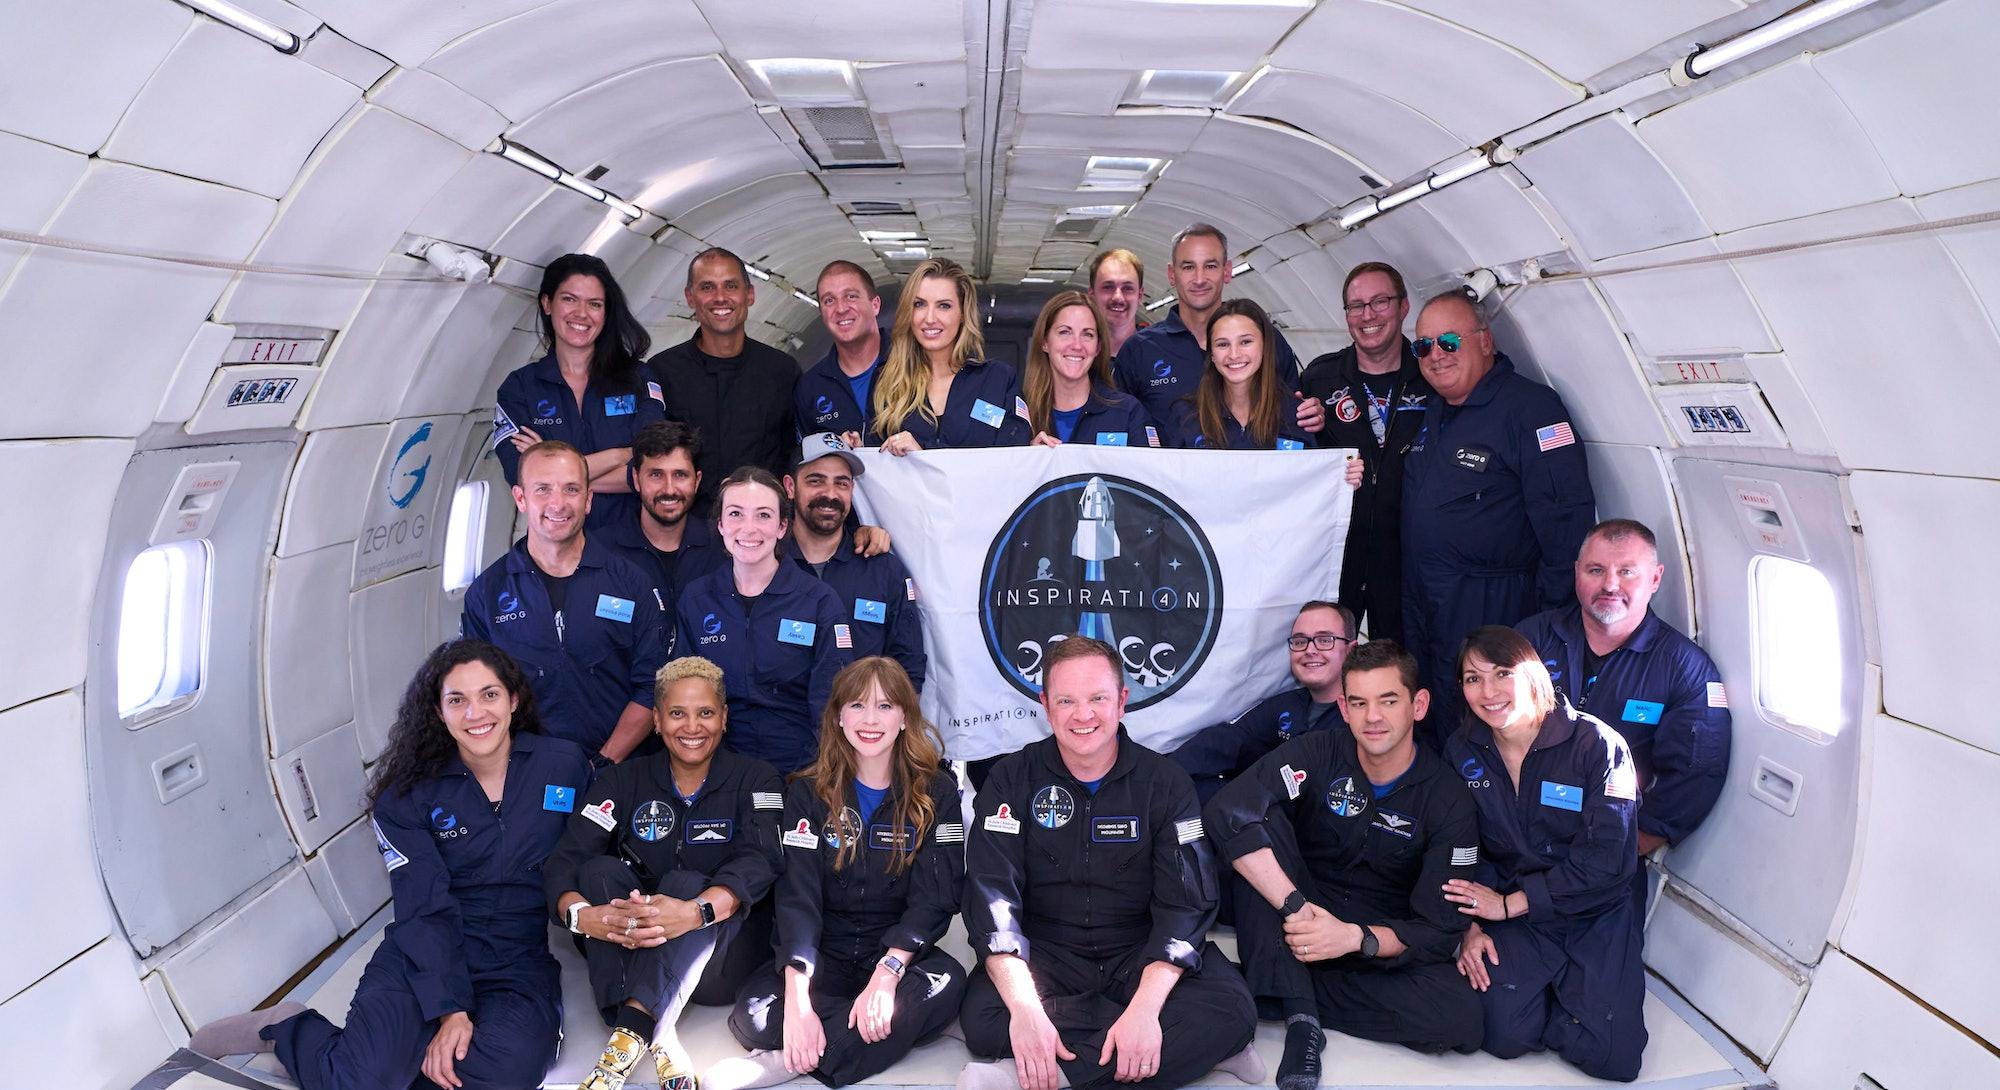 Inspiration4 civilian crew holding mission banner